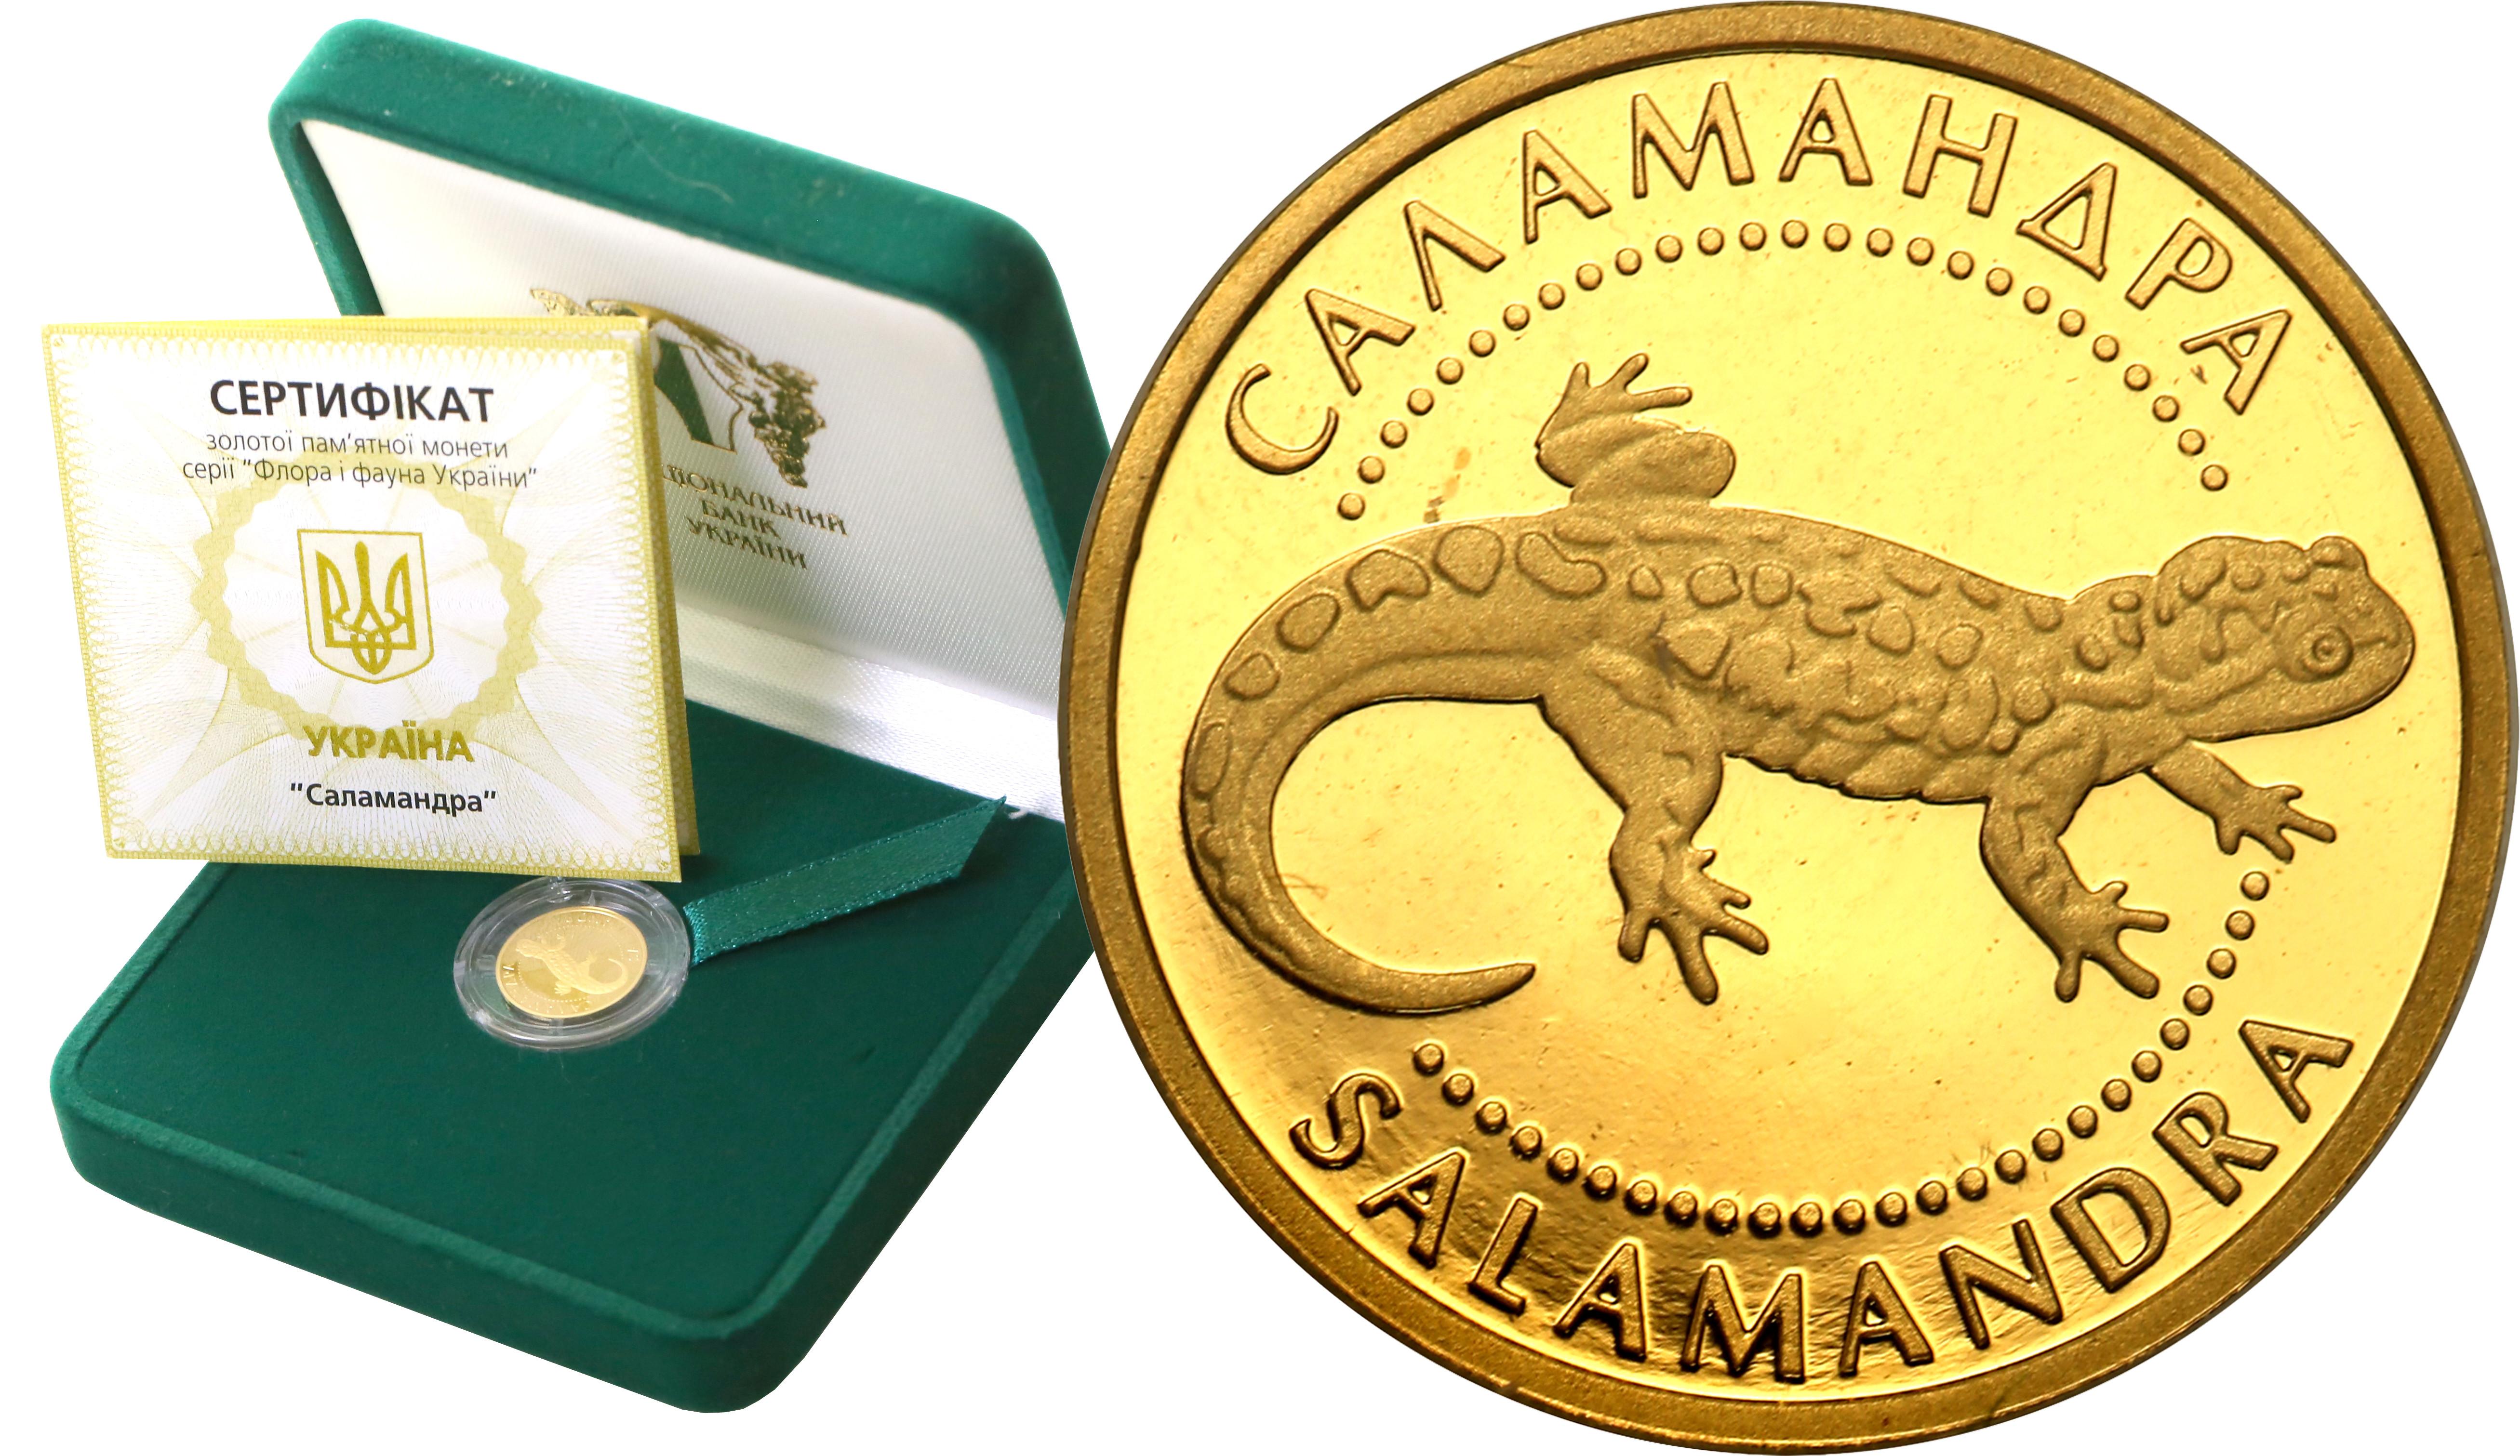 Ukraina 2 hrywny 2003 Salamandra 1/25 uncji czystego złota st. L